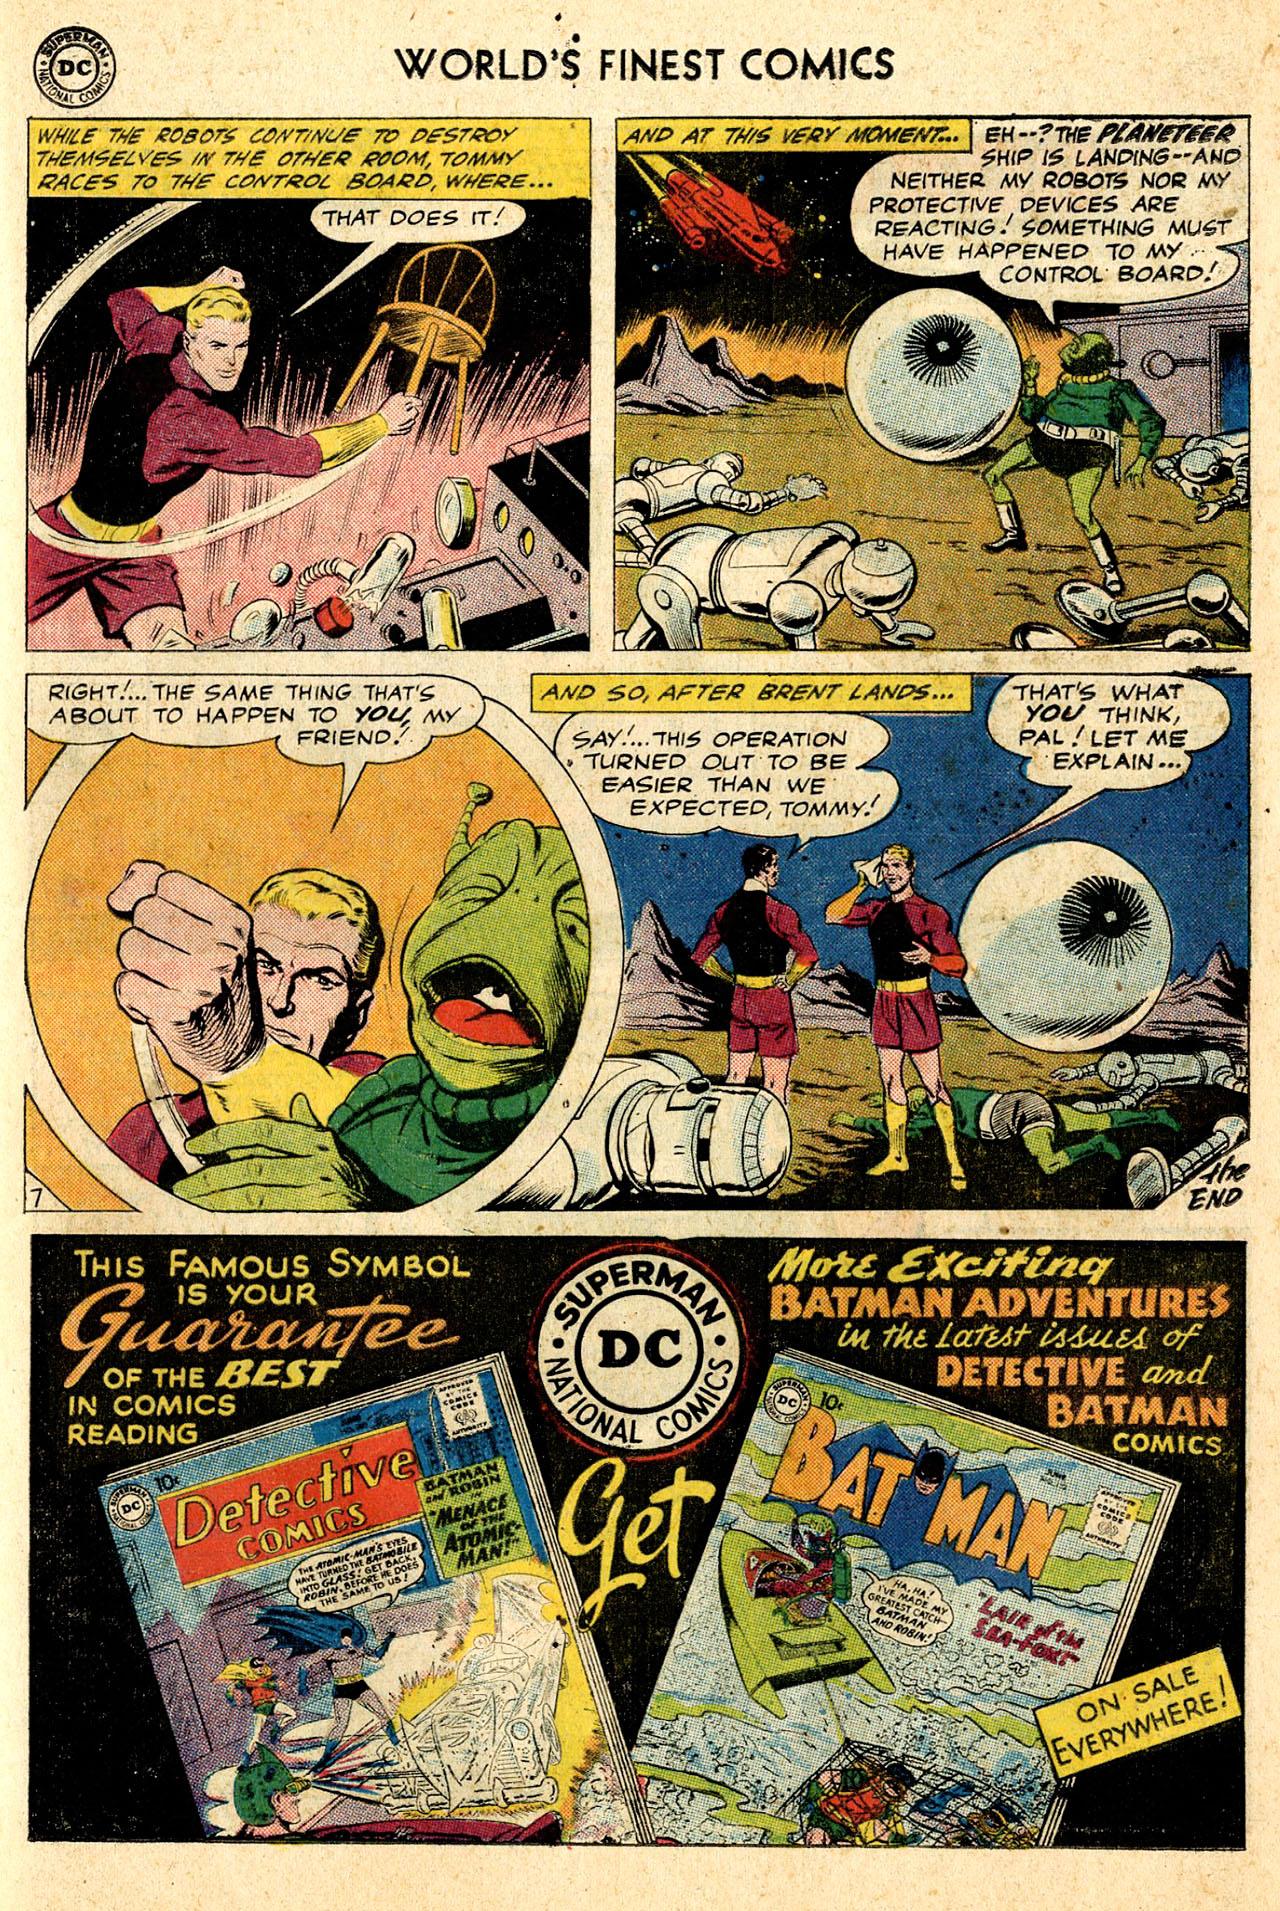 Read online World's Finest Comics comic -  Issue #110 - 23